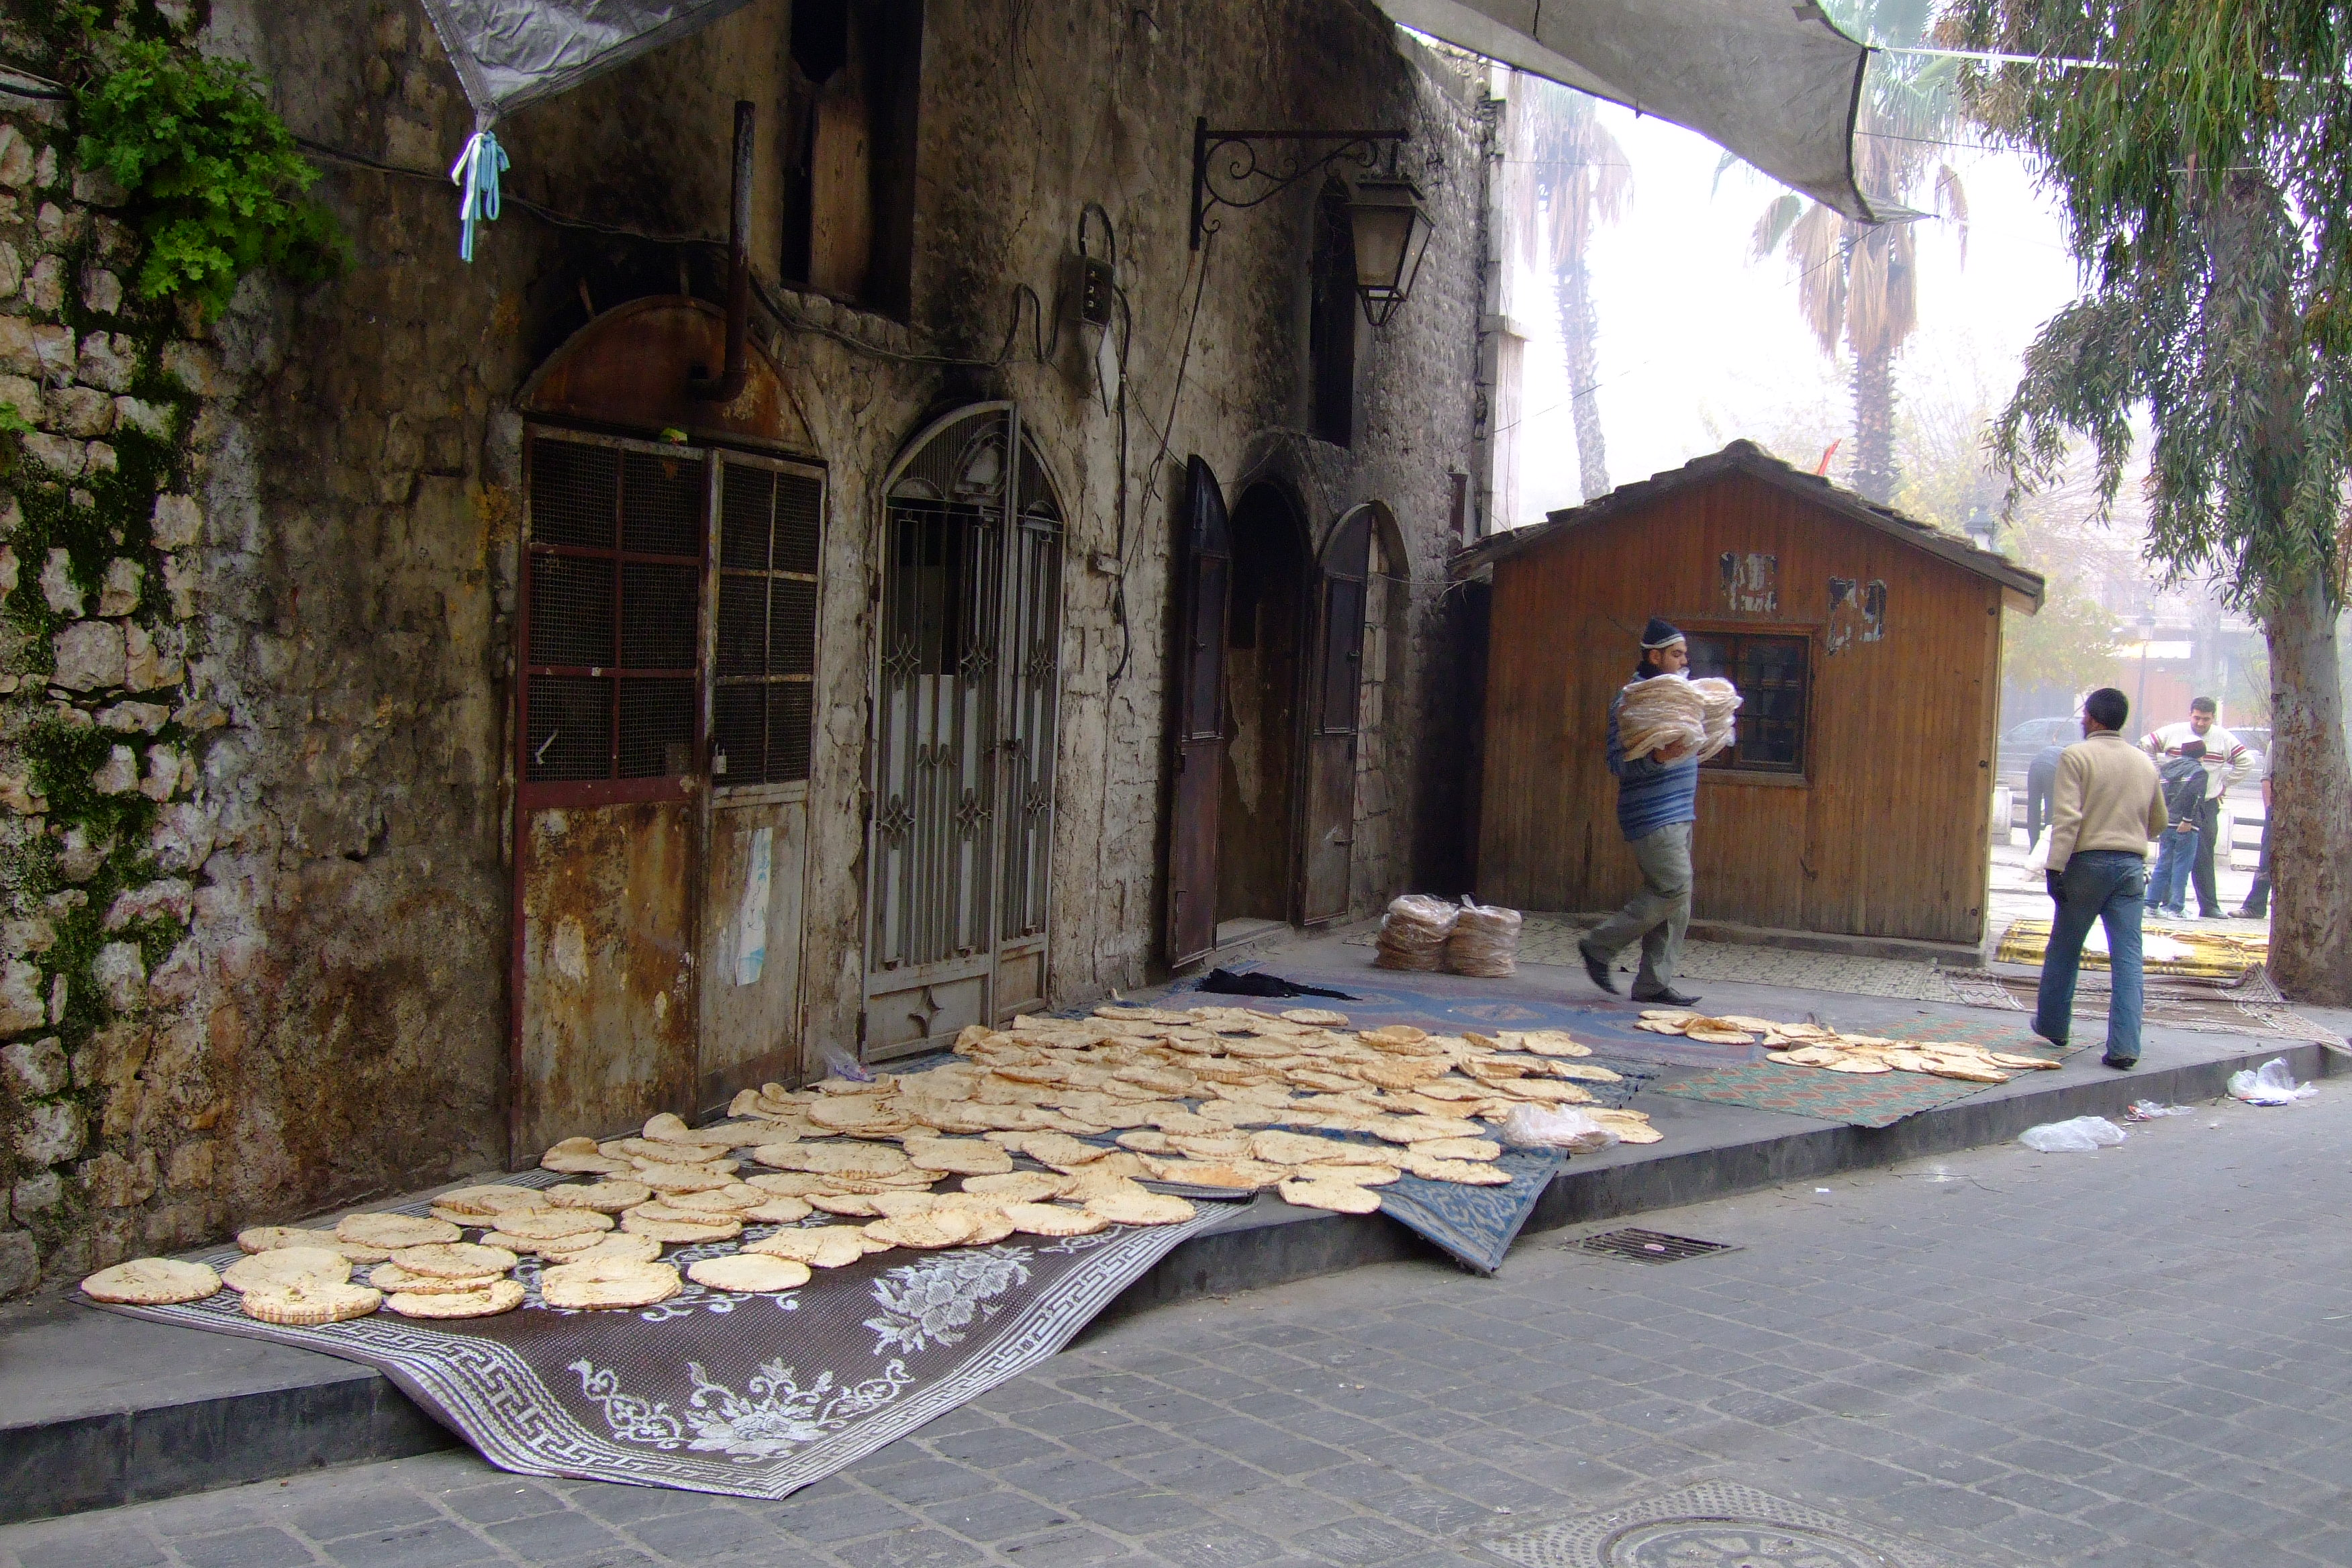 Luca Errera, Daniela Trastulli, Siria, Aleppo, forno, pane, strada